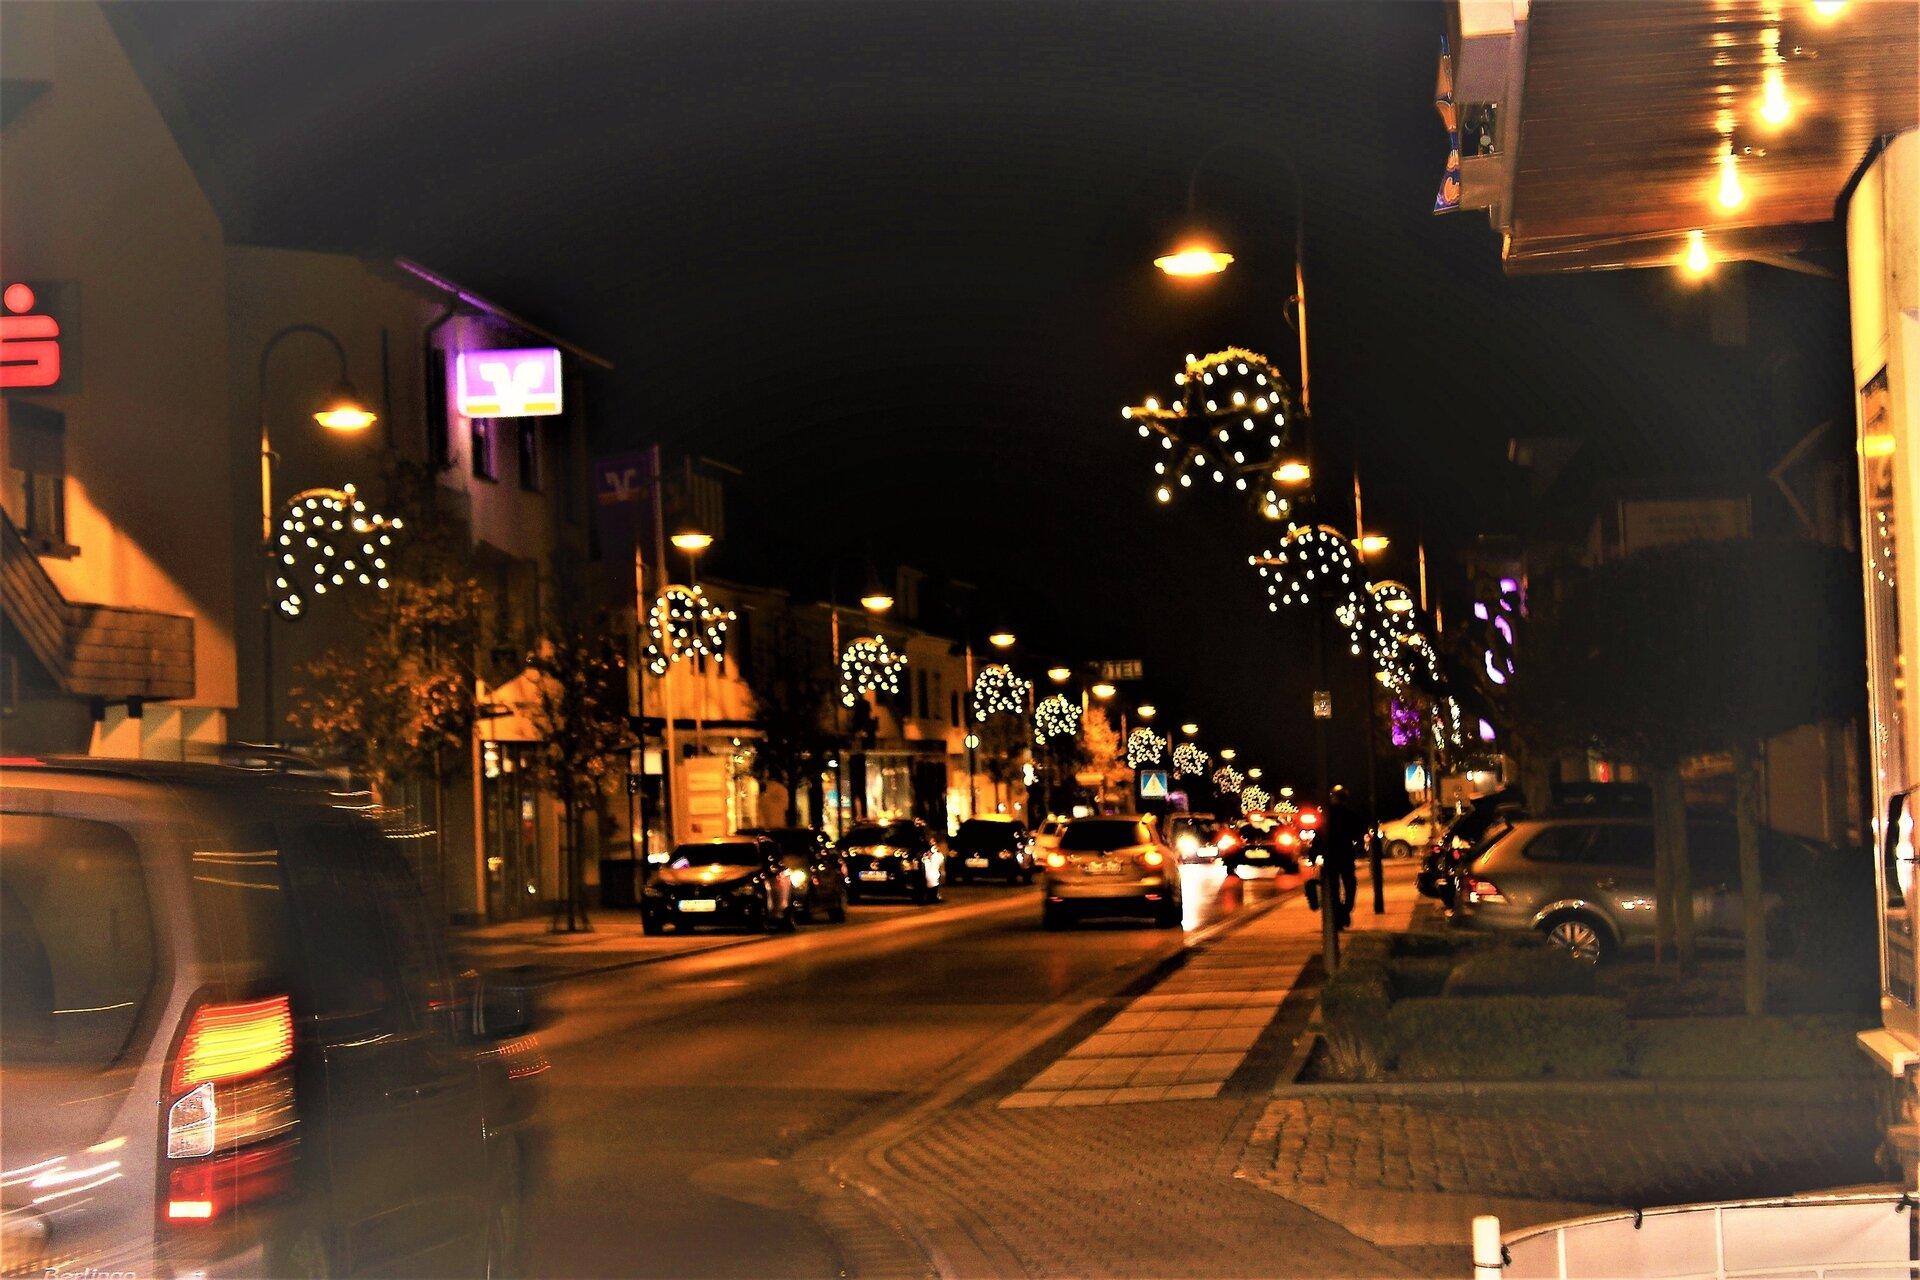 Rhein-Mosel-Stra_e-Weihnachtsbeleuchtung